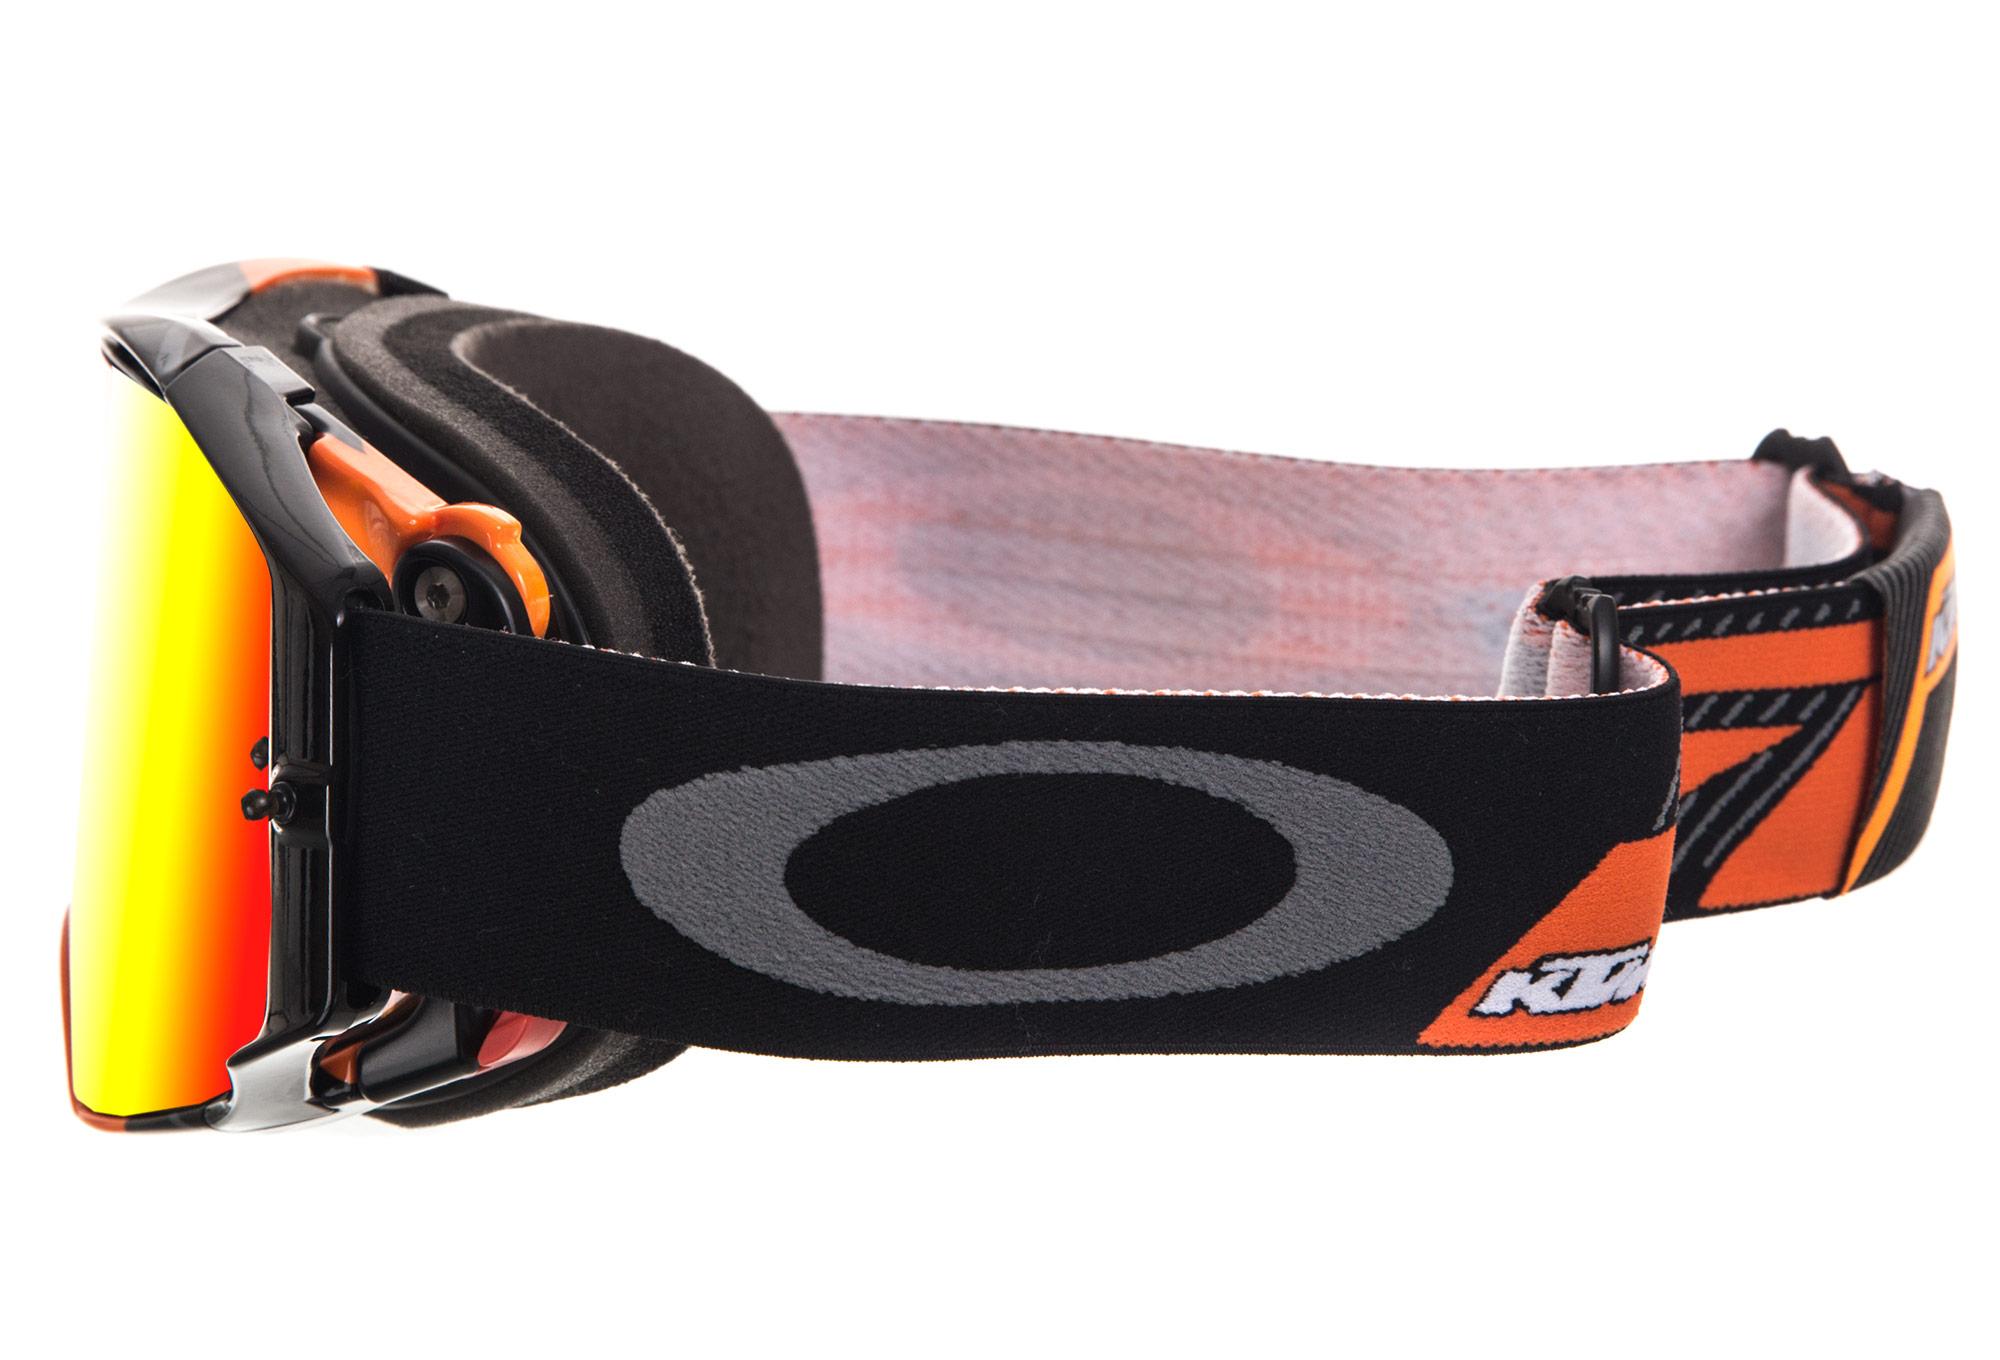 Mx Noir Iridium Oakley Ktm Oo7046 Réf Airbrake Masque 03 Jaune q5jR4Sc3AL